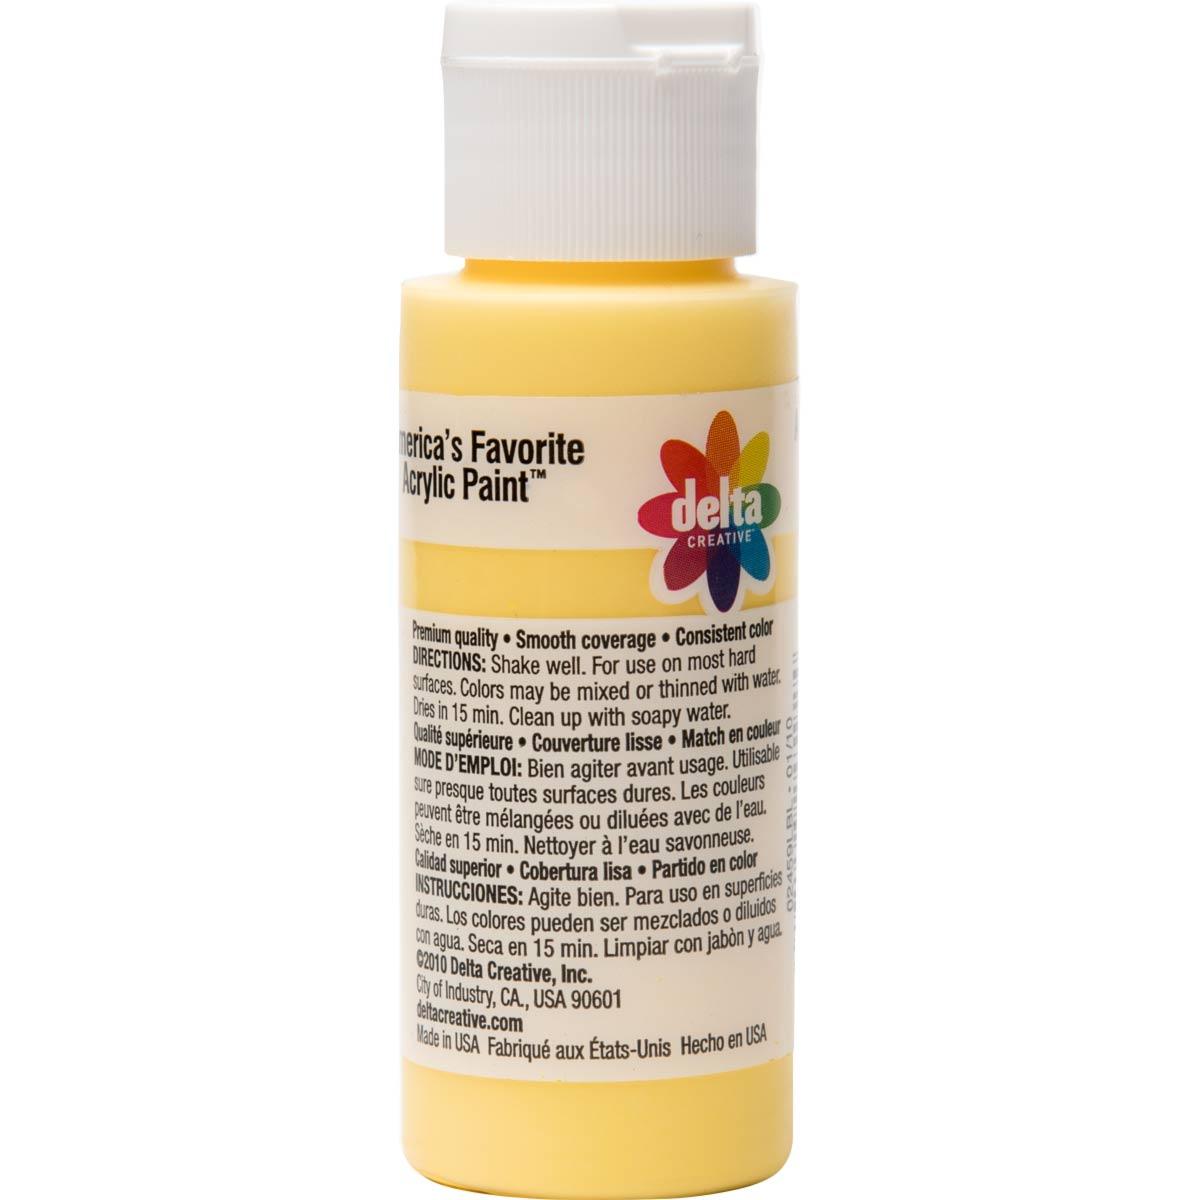 Delta Ceramcoat ® Acrylic Paint - Crocus Yellow, 2 oz.